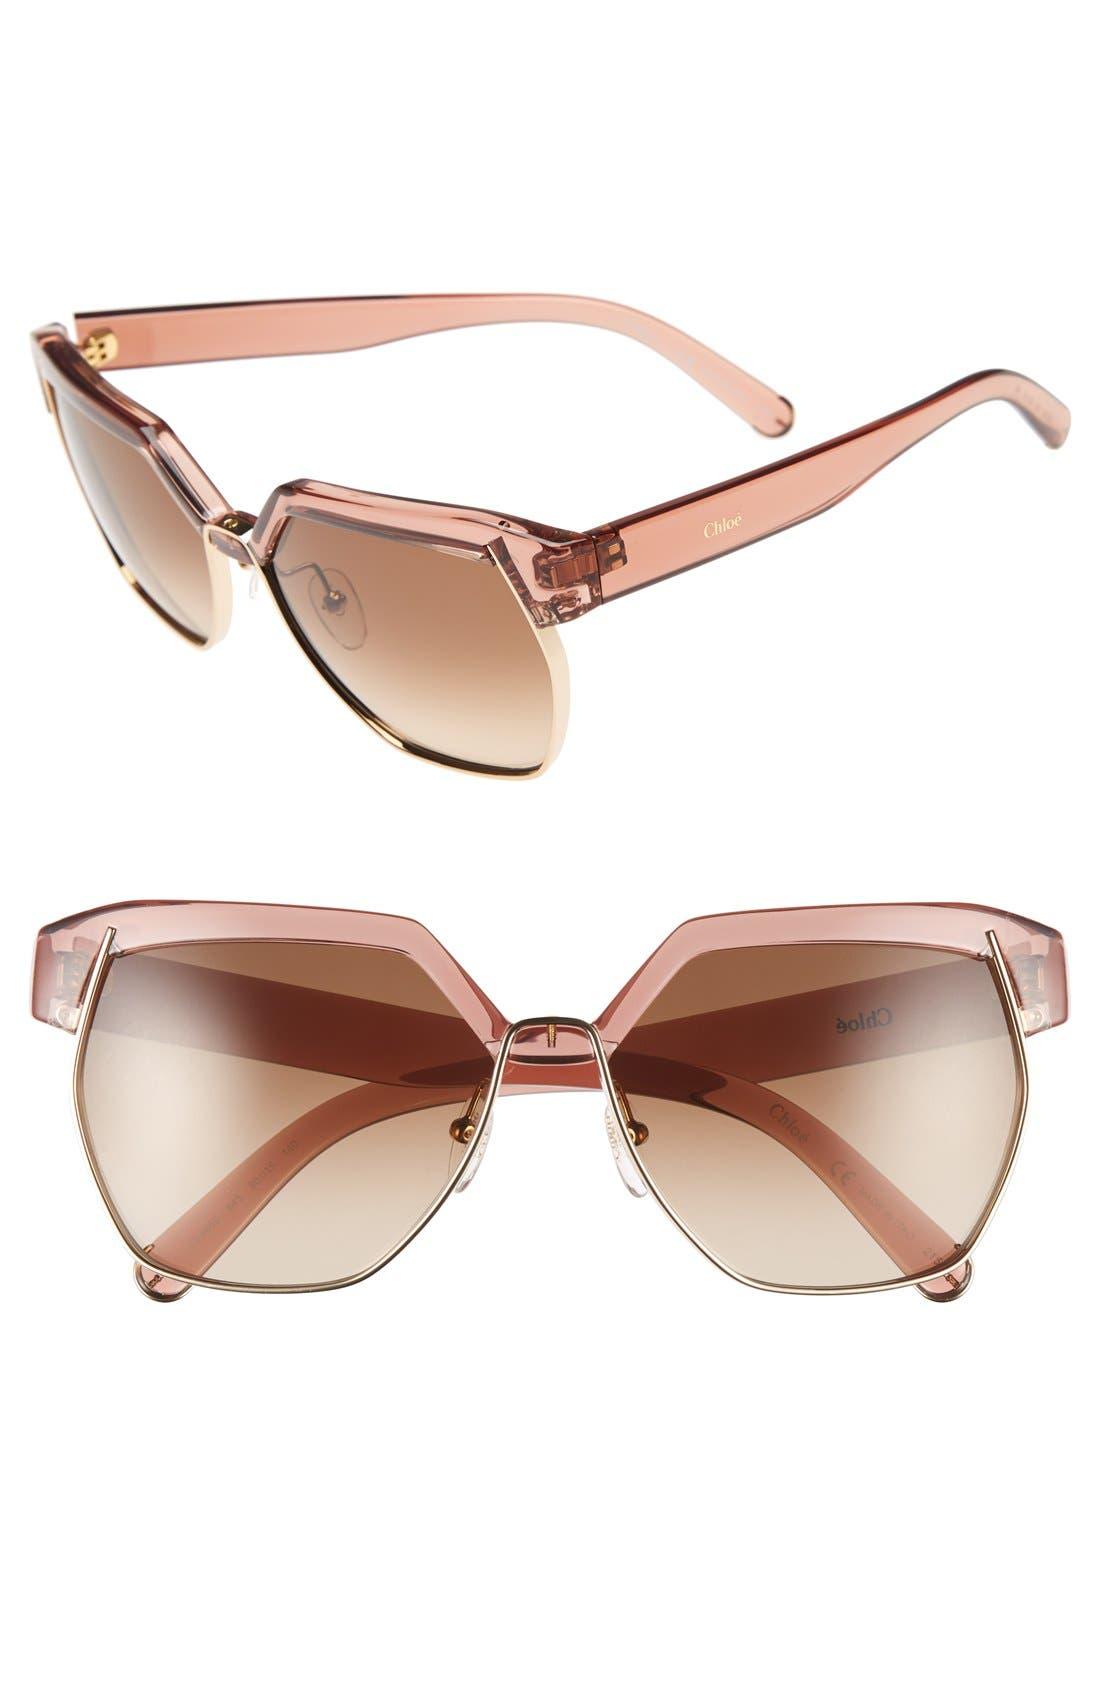 Main Image - Chloé 'Dafne ' 60mm Gradient Sunglasses